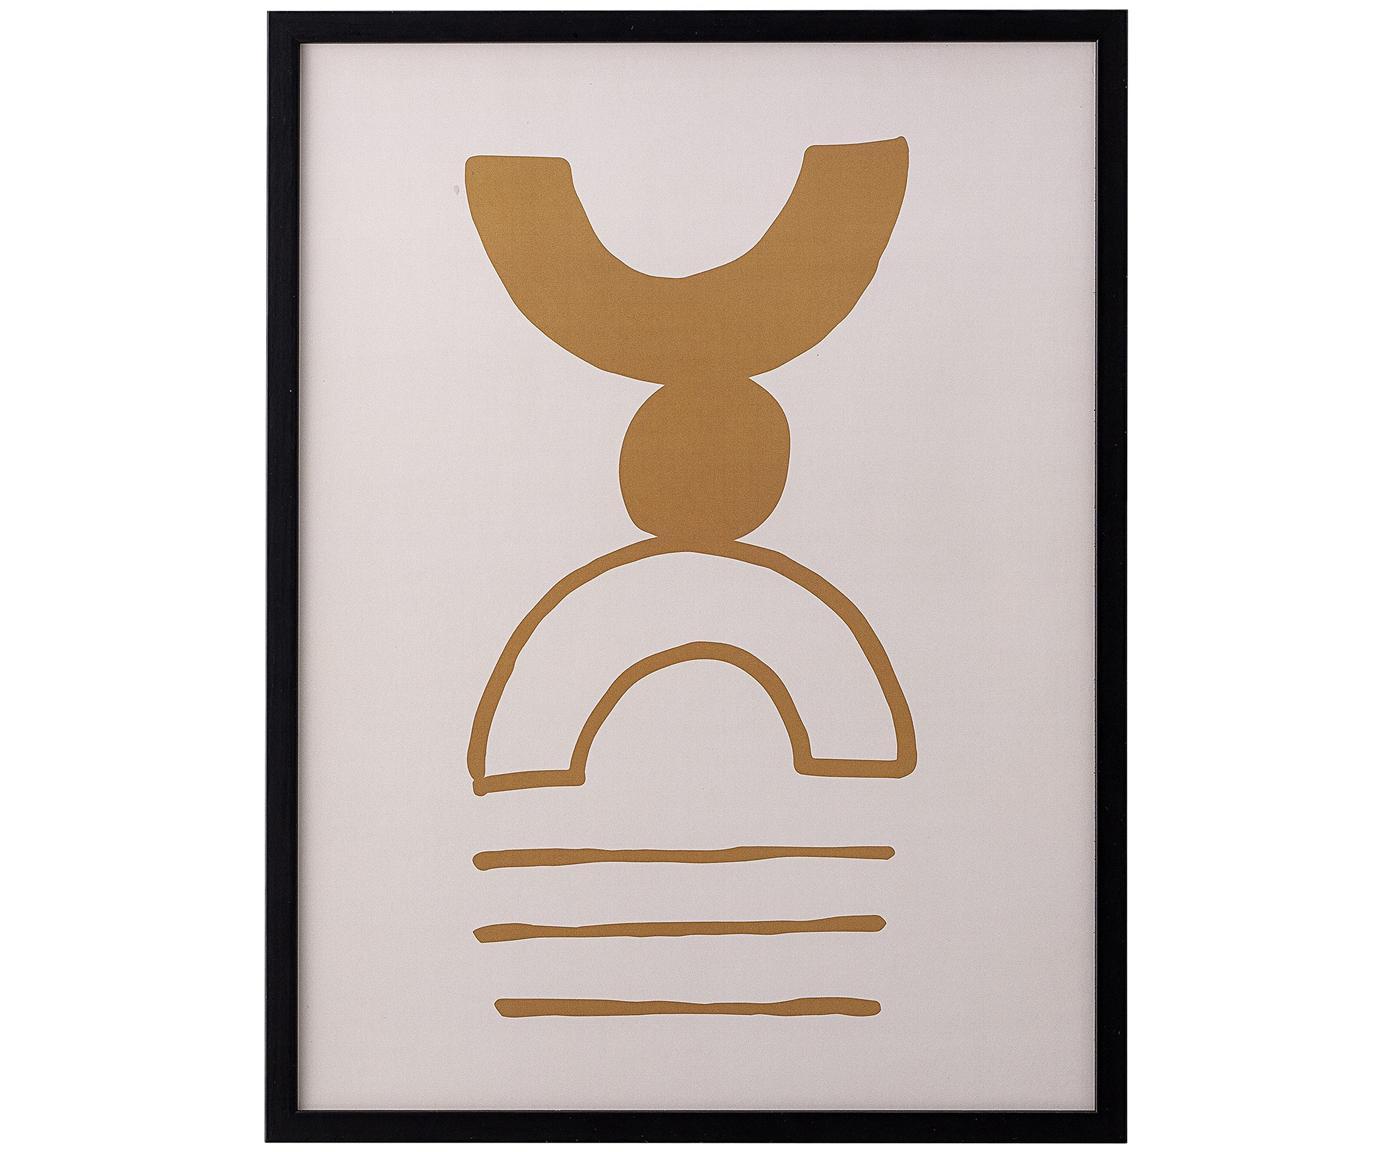 Stampa digitale incorniciata Kaya, Cornice: legno, Immagine: carta, Beige, marrone, nero, Larg. 32 x Alt. 42 cm